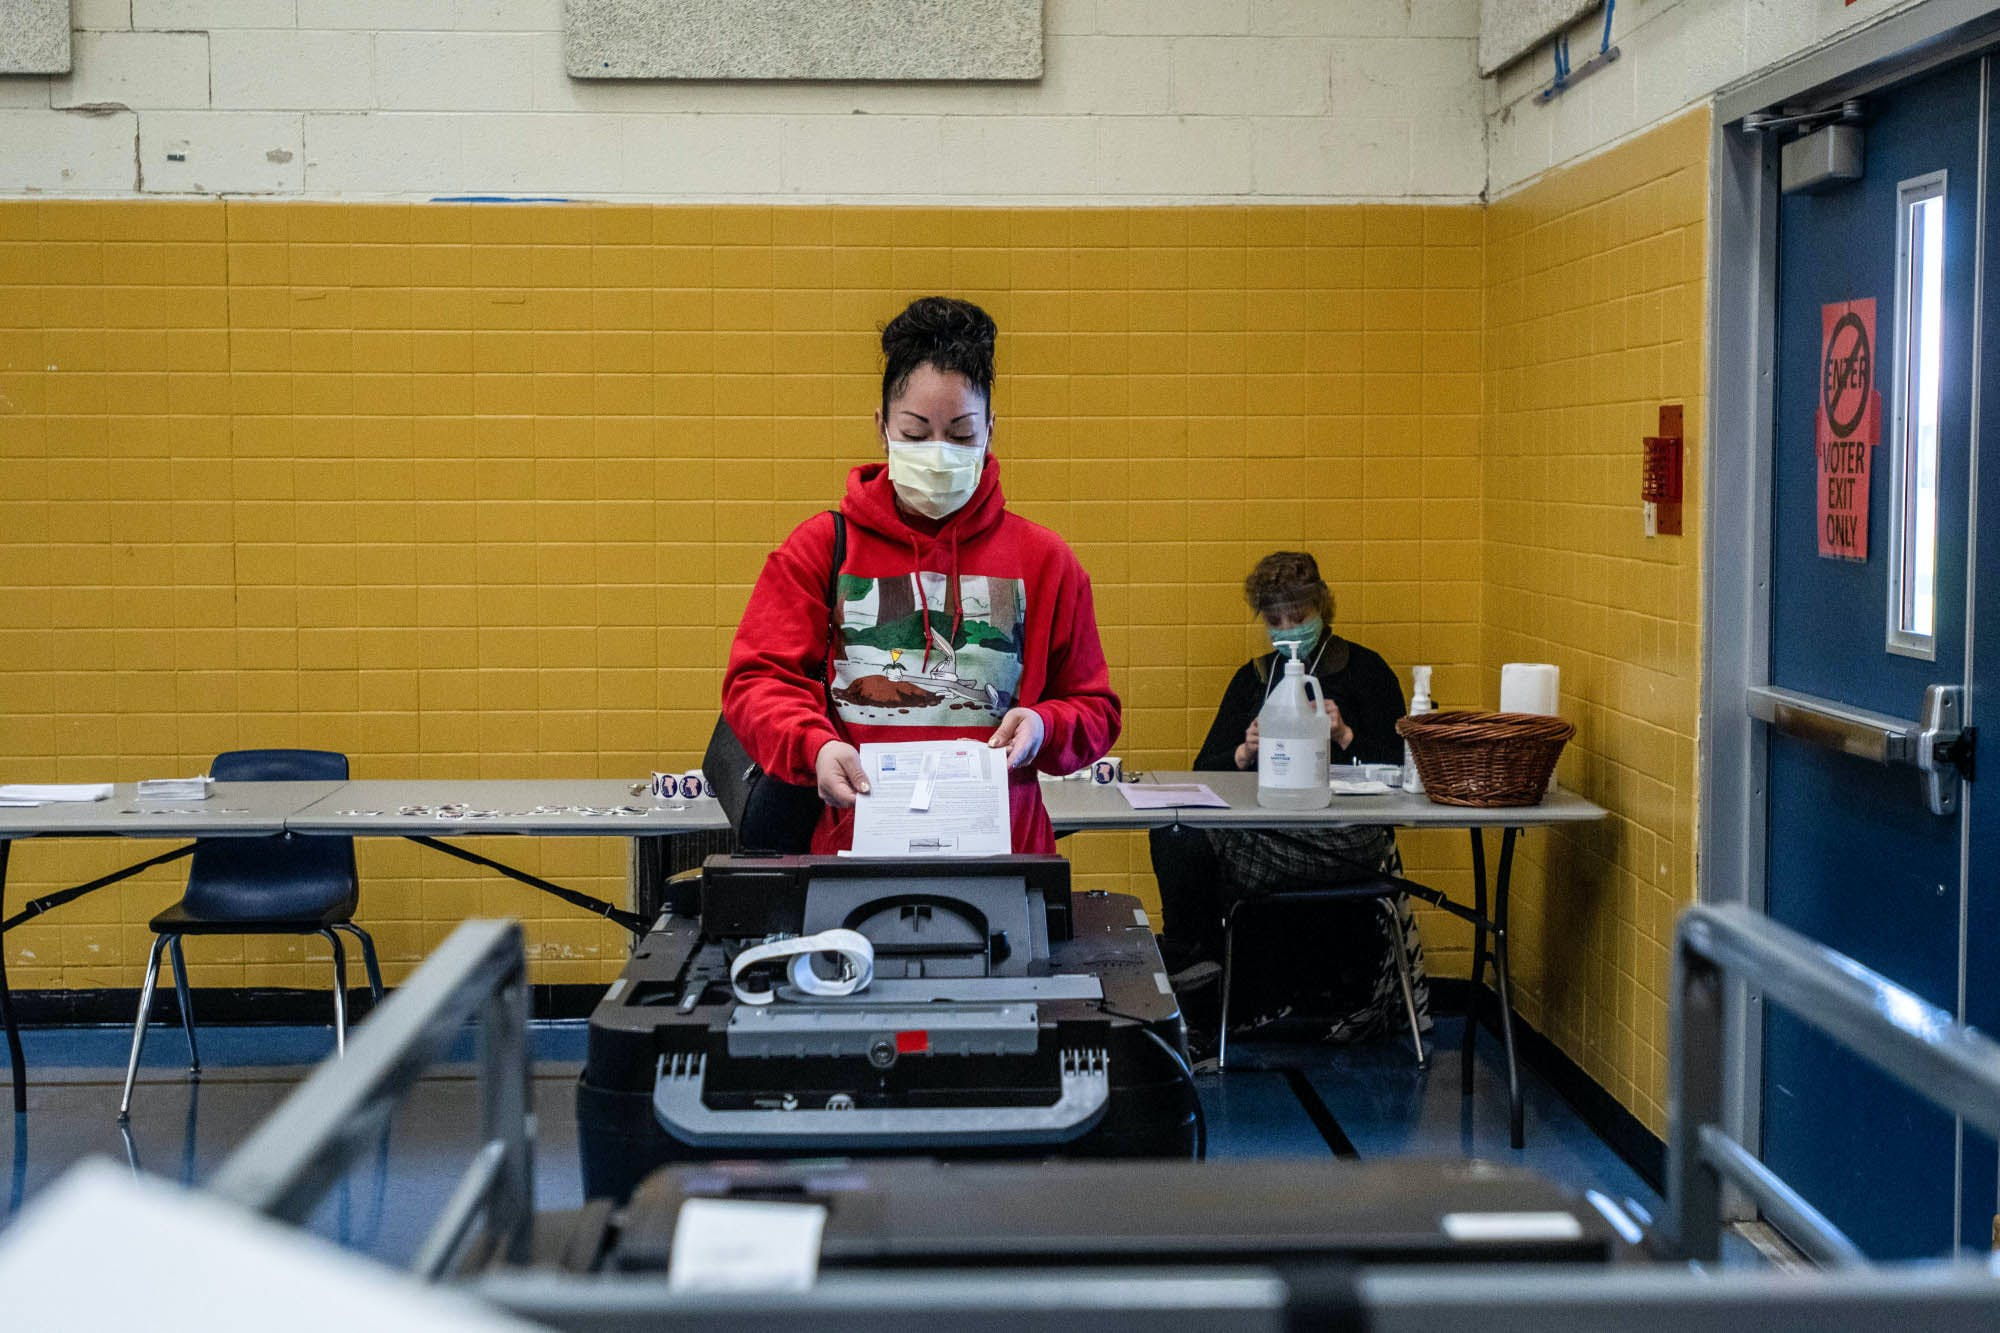 AA voter feeds their ballot into a machine.